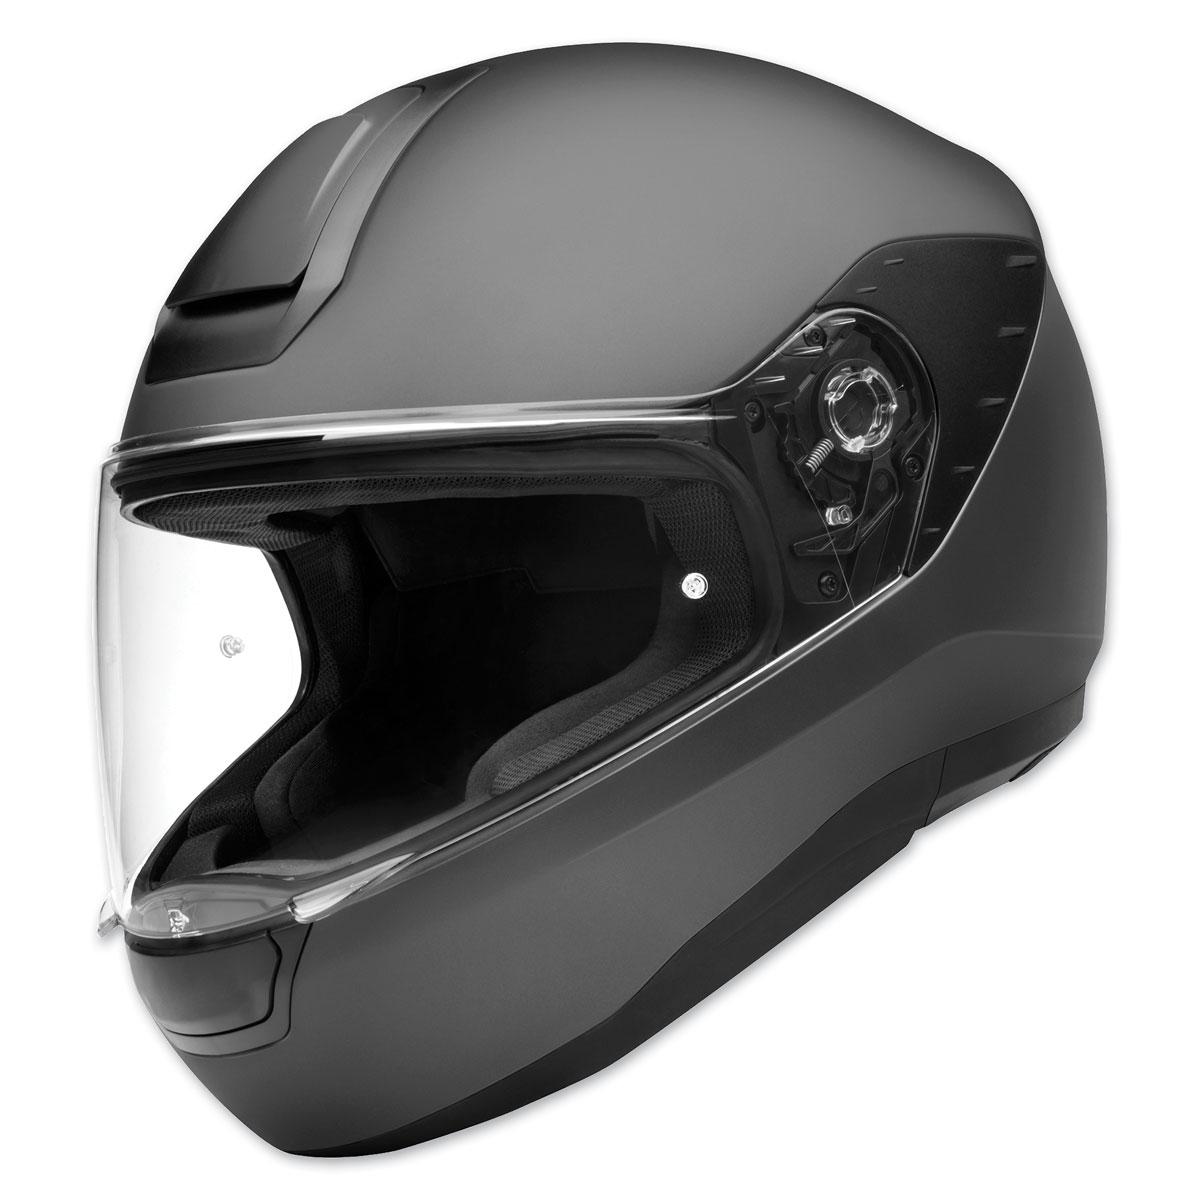 Schuberth R2 Matte Anthracite Full Face Helmet